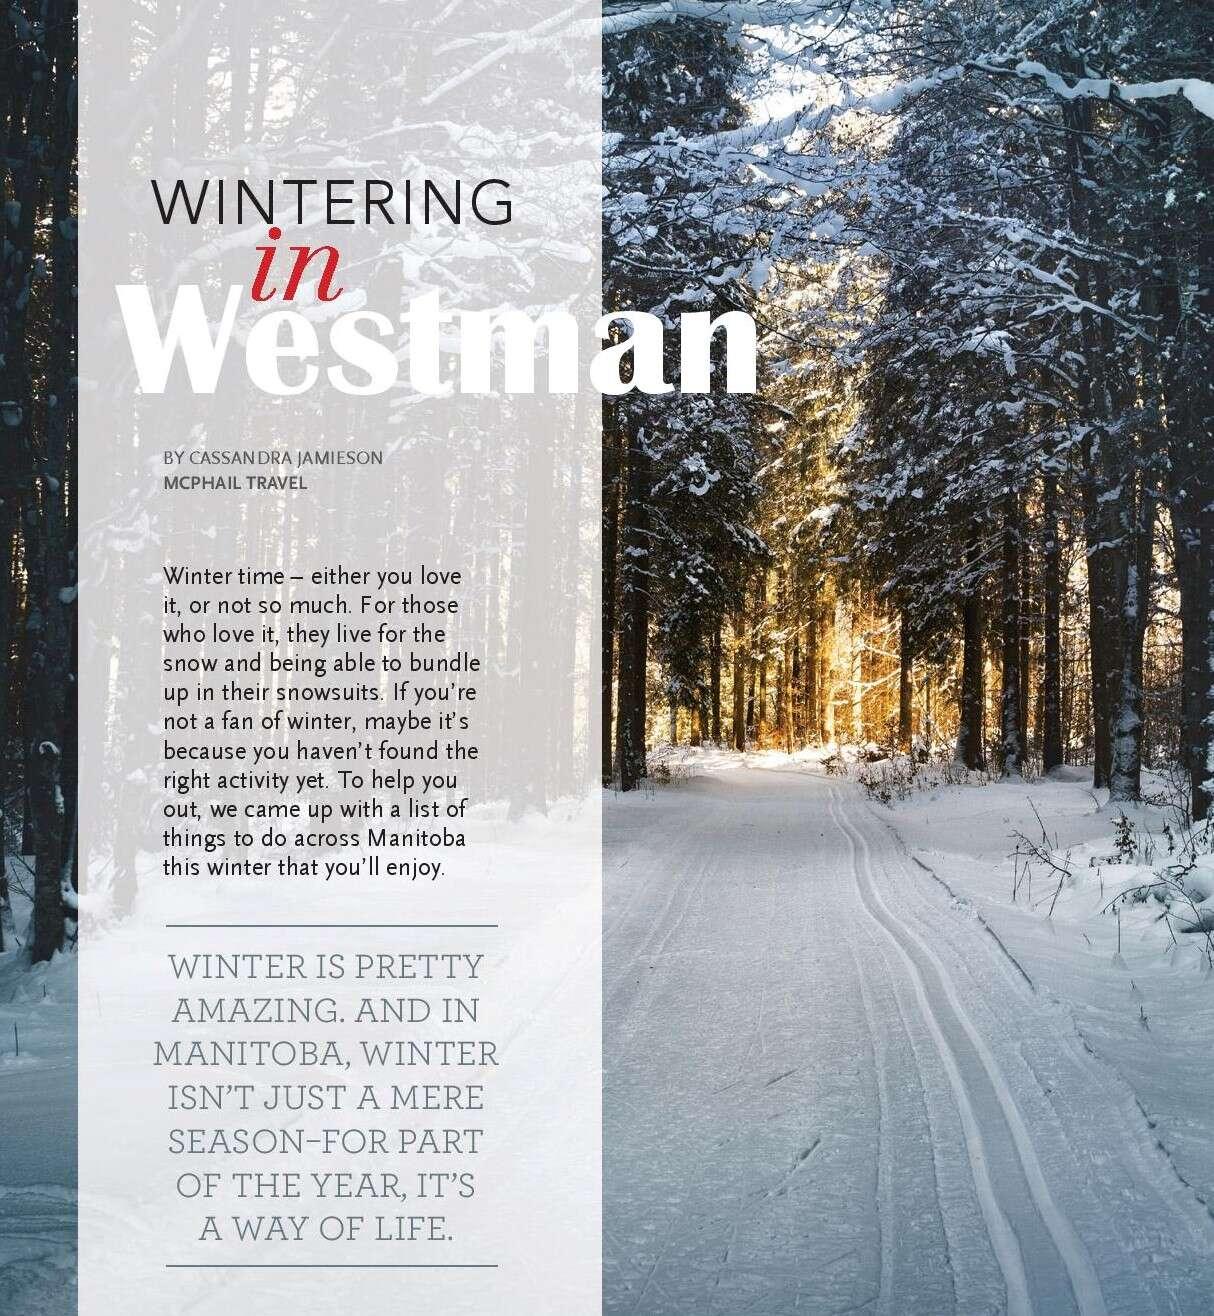 WINTERING in Westman